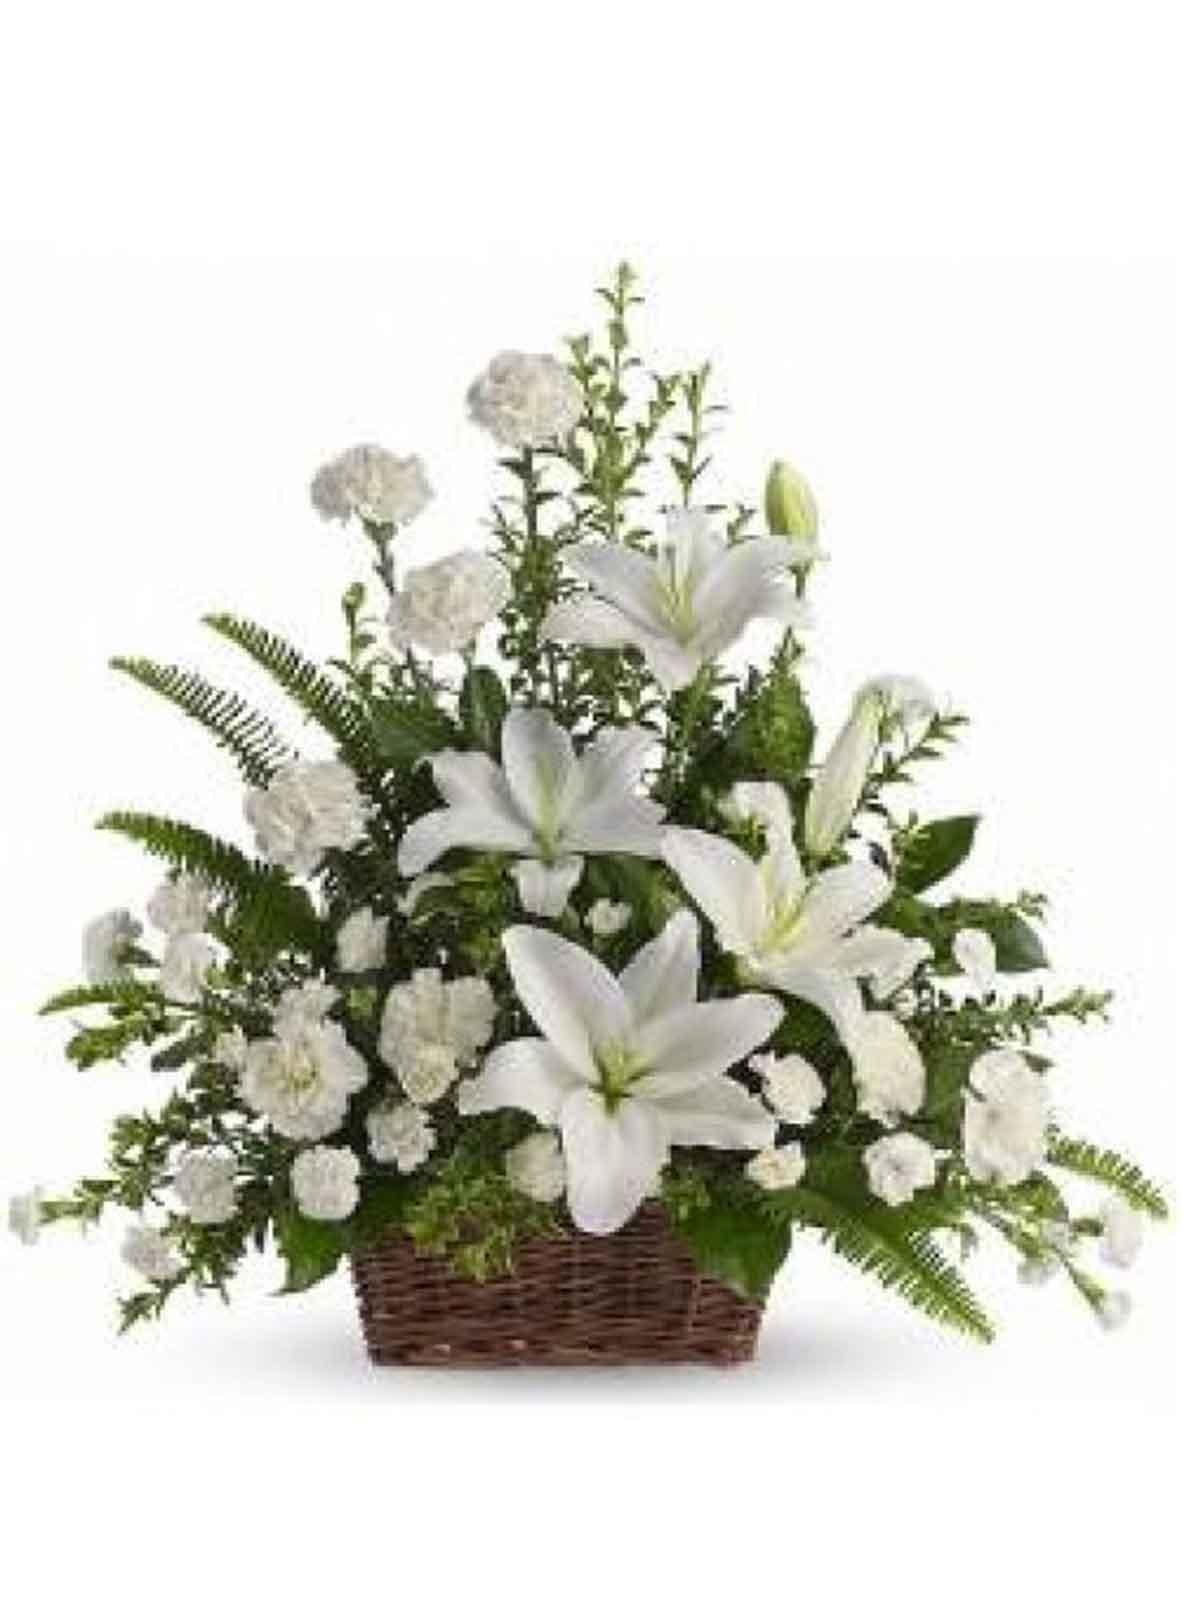 1130 Funeral Basket 010